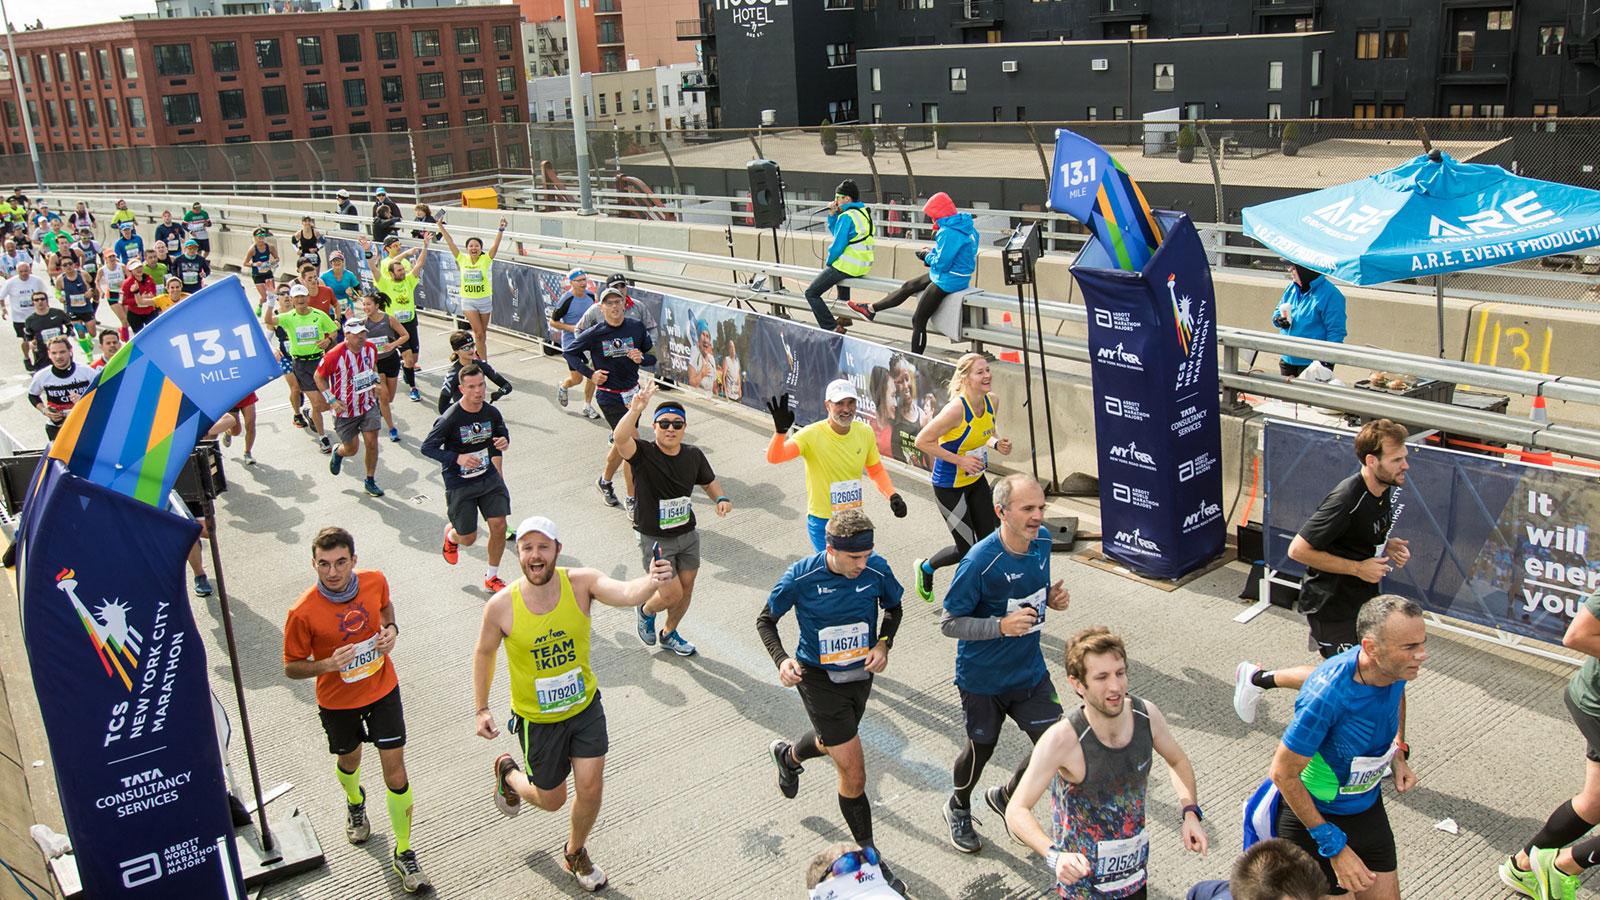 Runners at 13.1 miles at 2019 TCS New York City Marathon